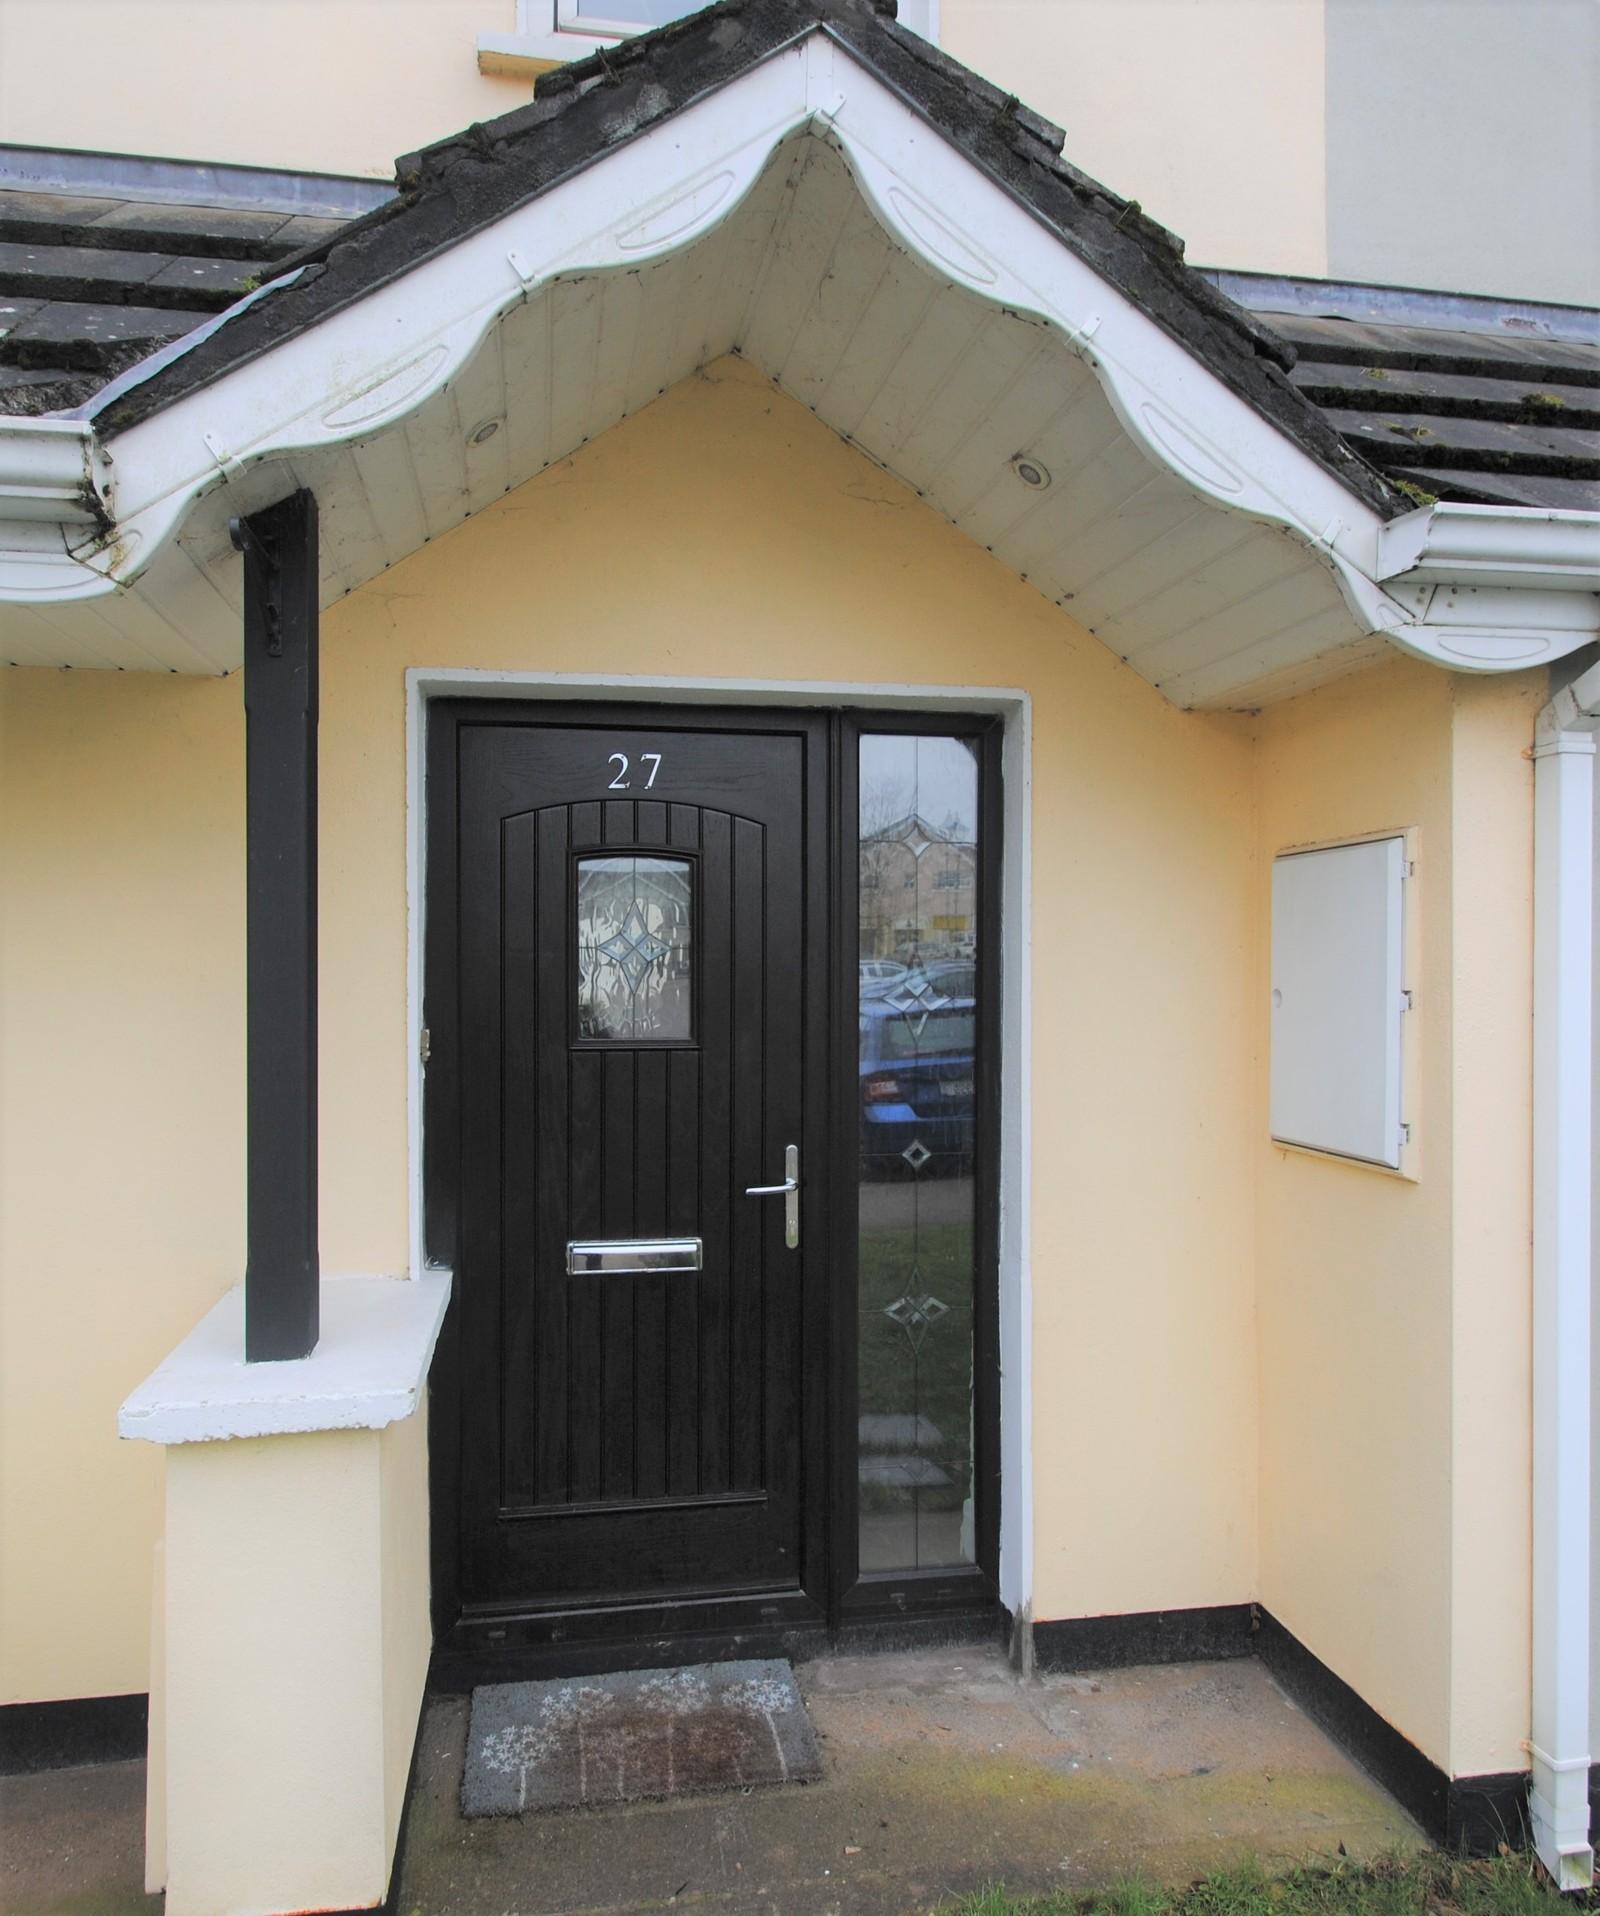 27 Gleann Alainn, Ballygarvan, Co. Cork